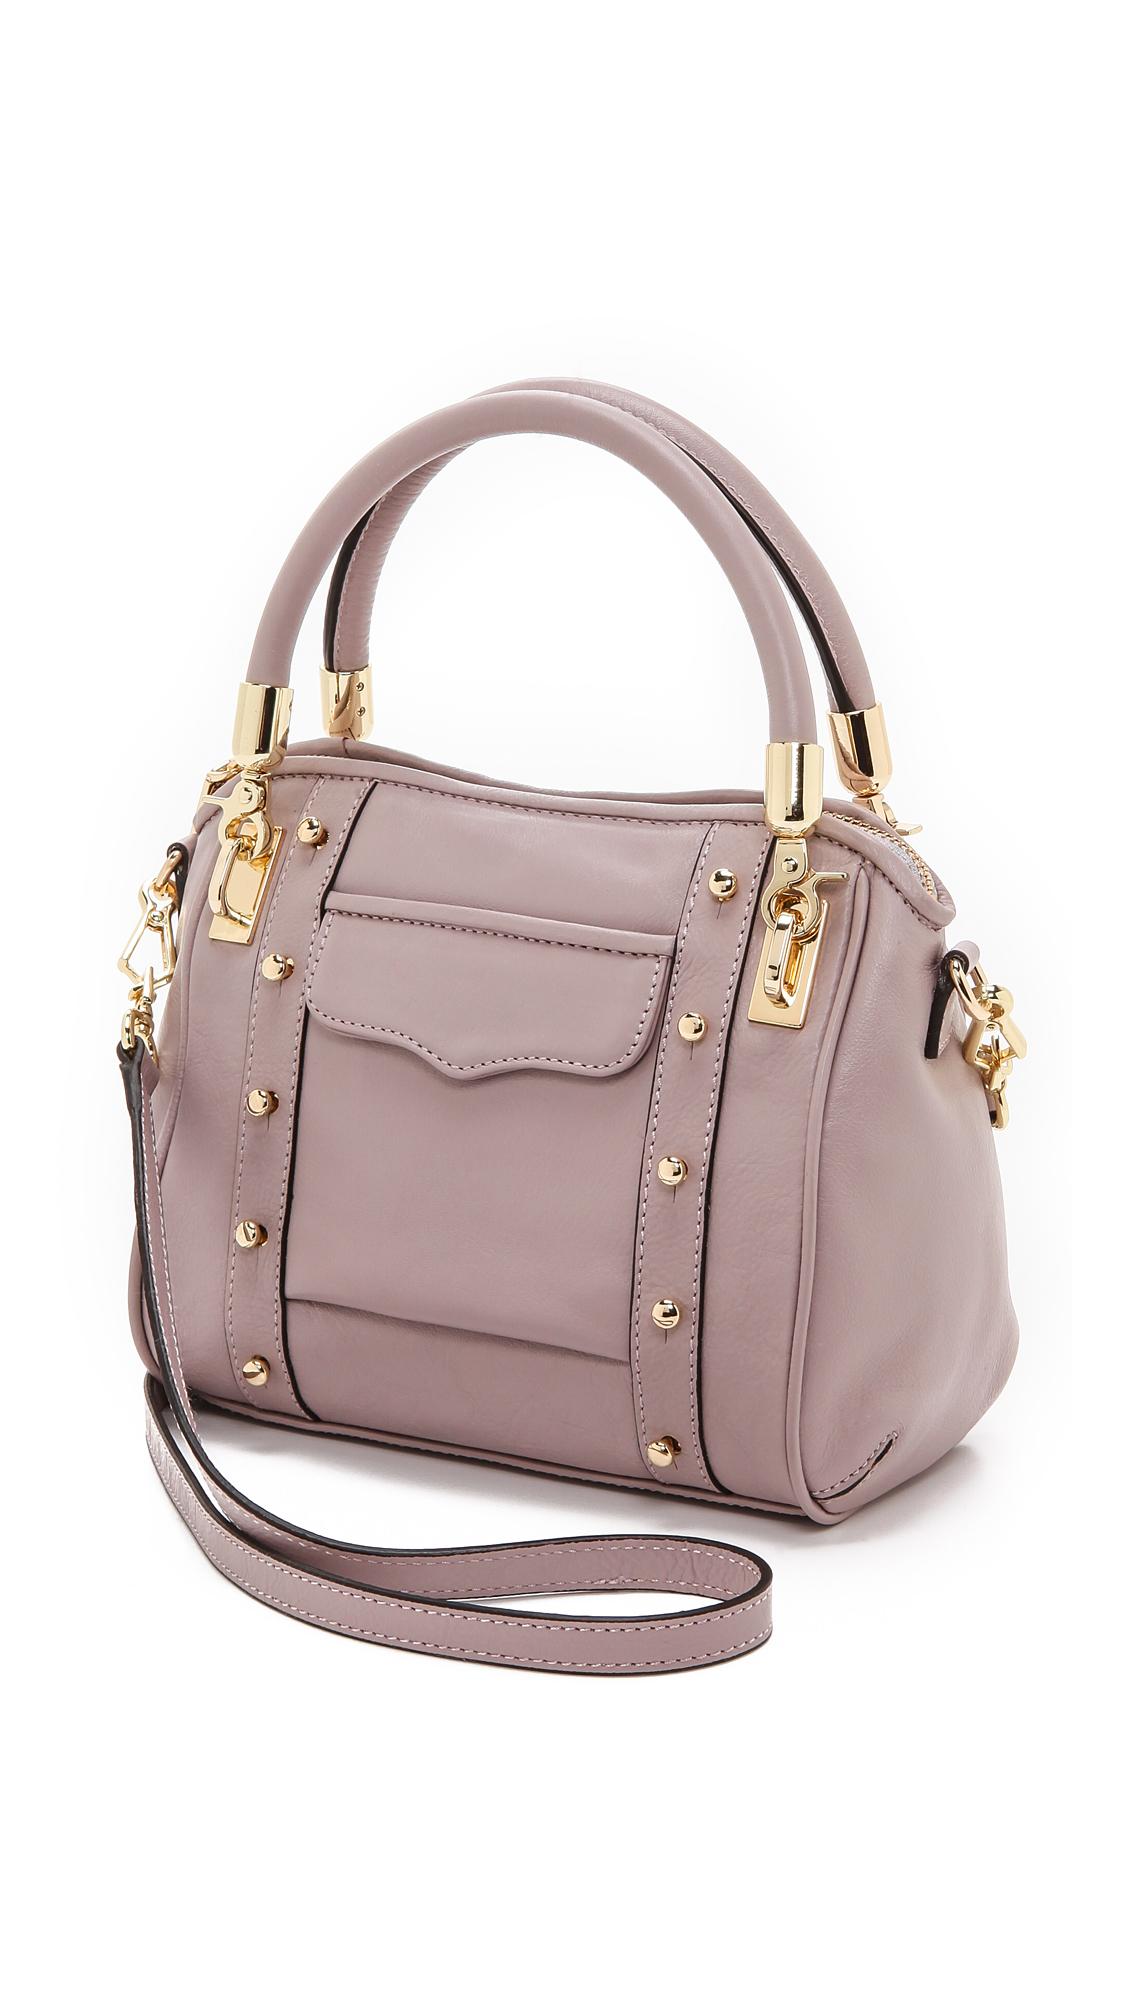 547d940134ee Rebecca Minkoff Cupid Mini Bag